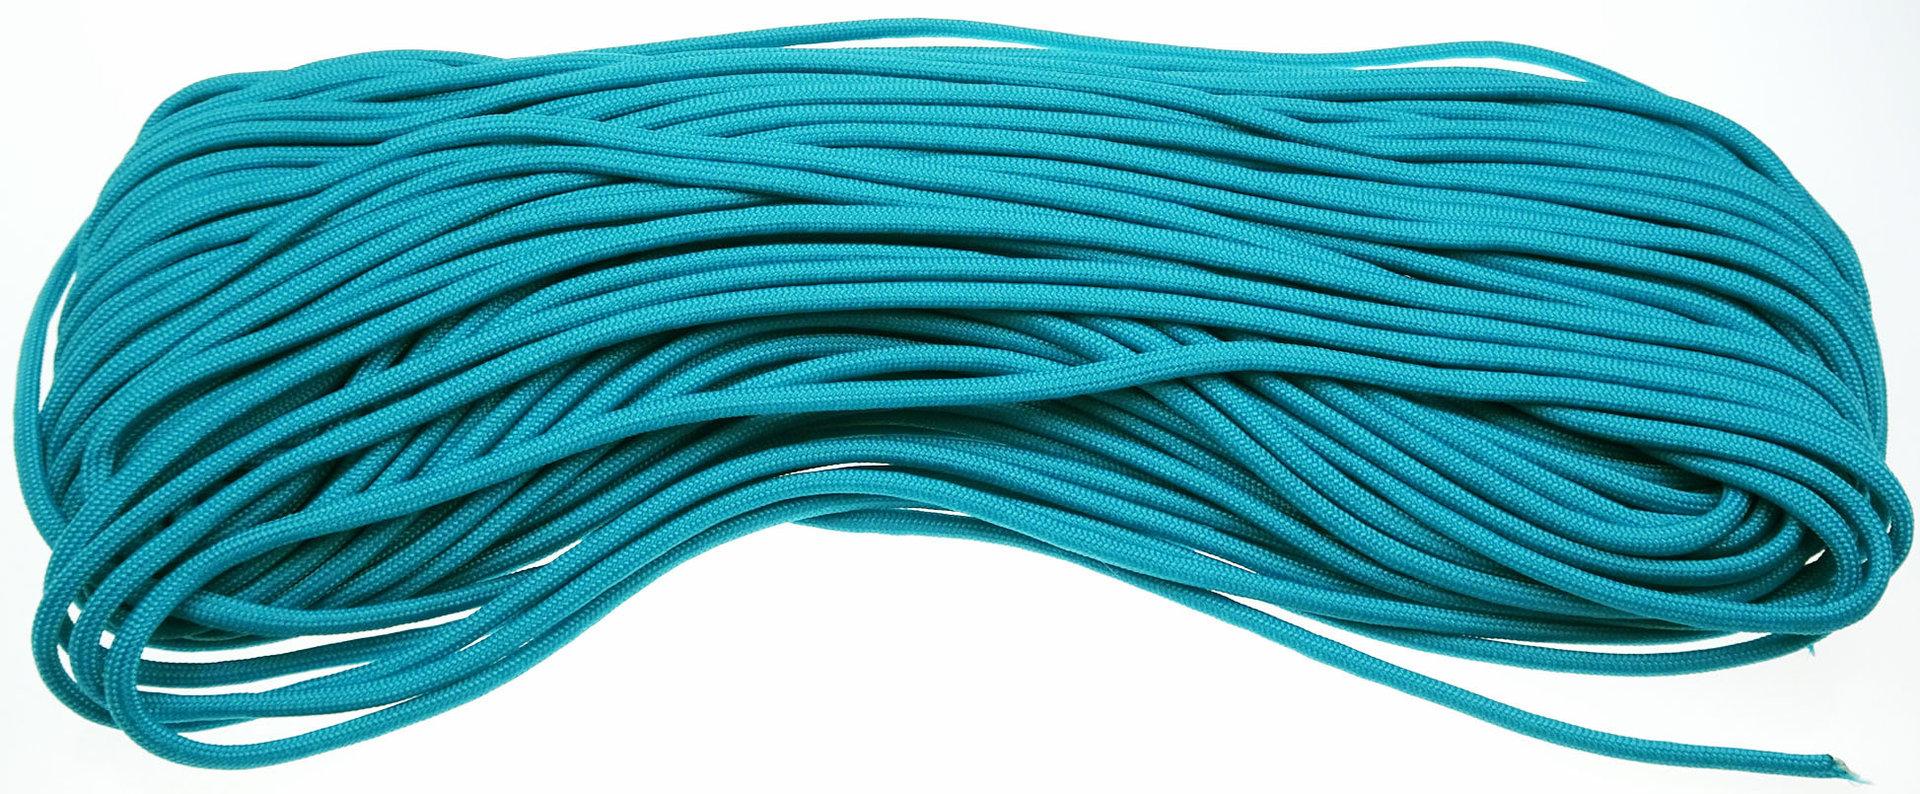 P Cord Paracord 550 Neon Turquoise Outdoormesser De